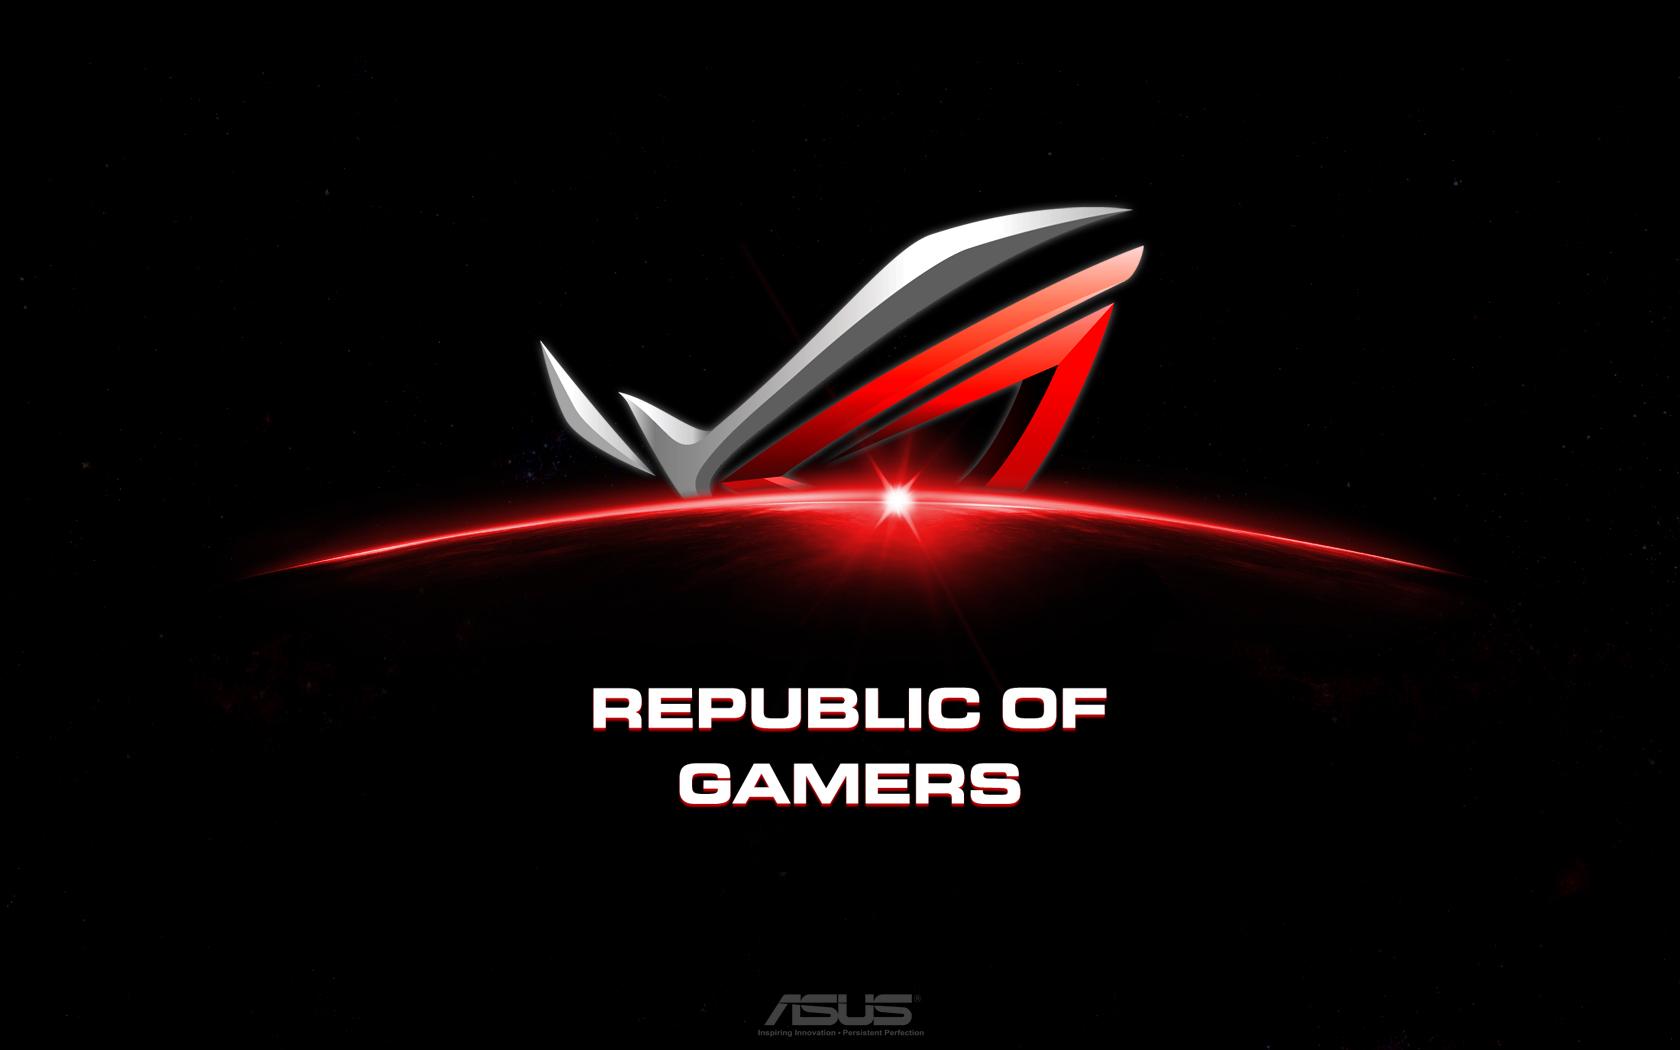 republic of gamers wallpaper 1680x1050